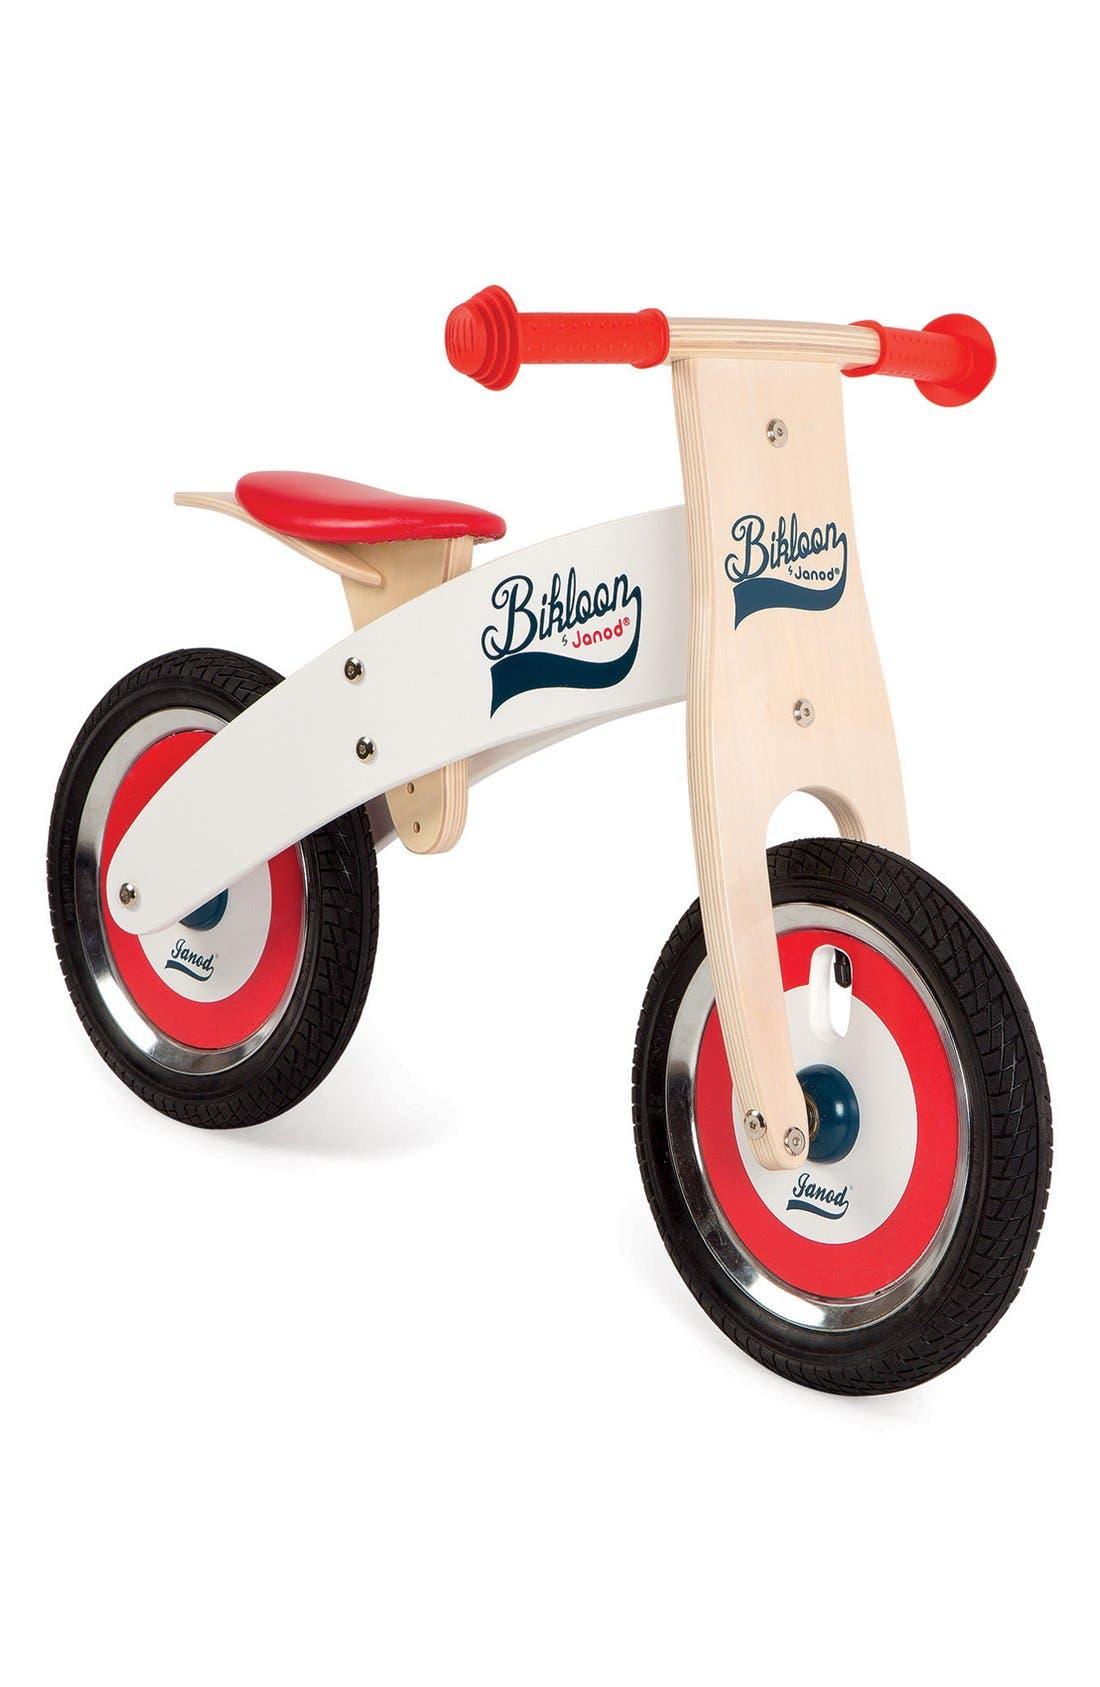 'Bikloon' Balance Bike,                             Main thumbnail 1, color,                             RED